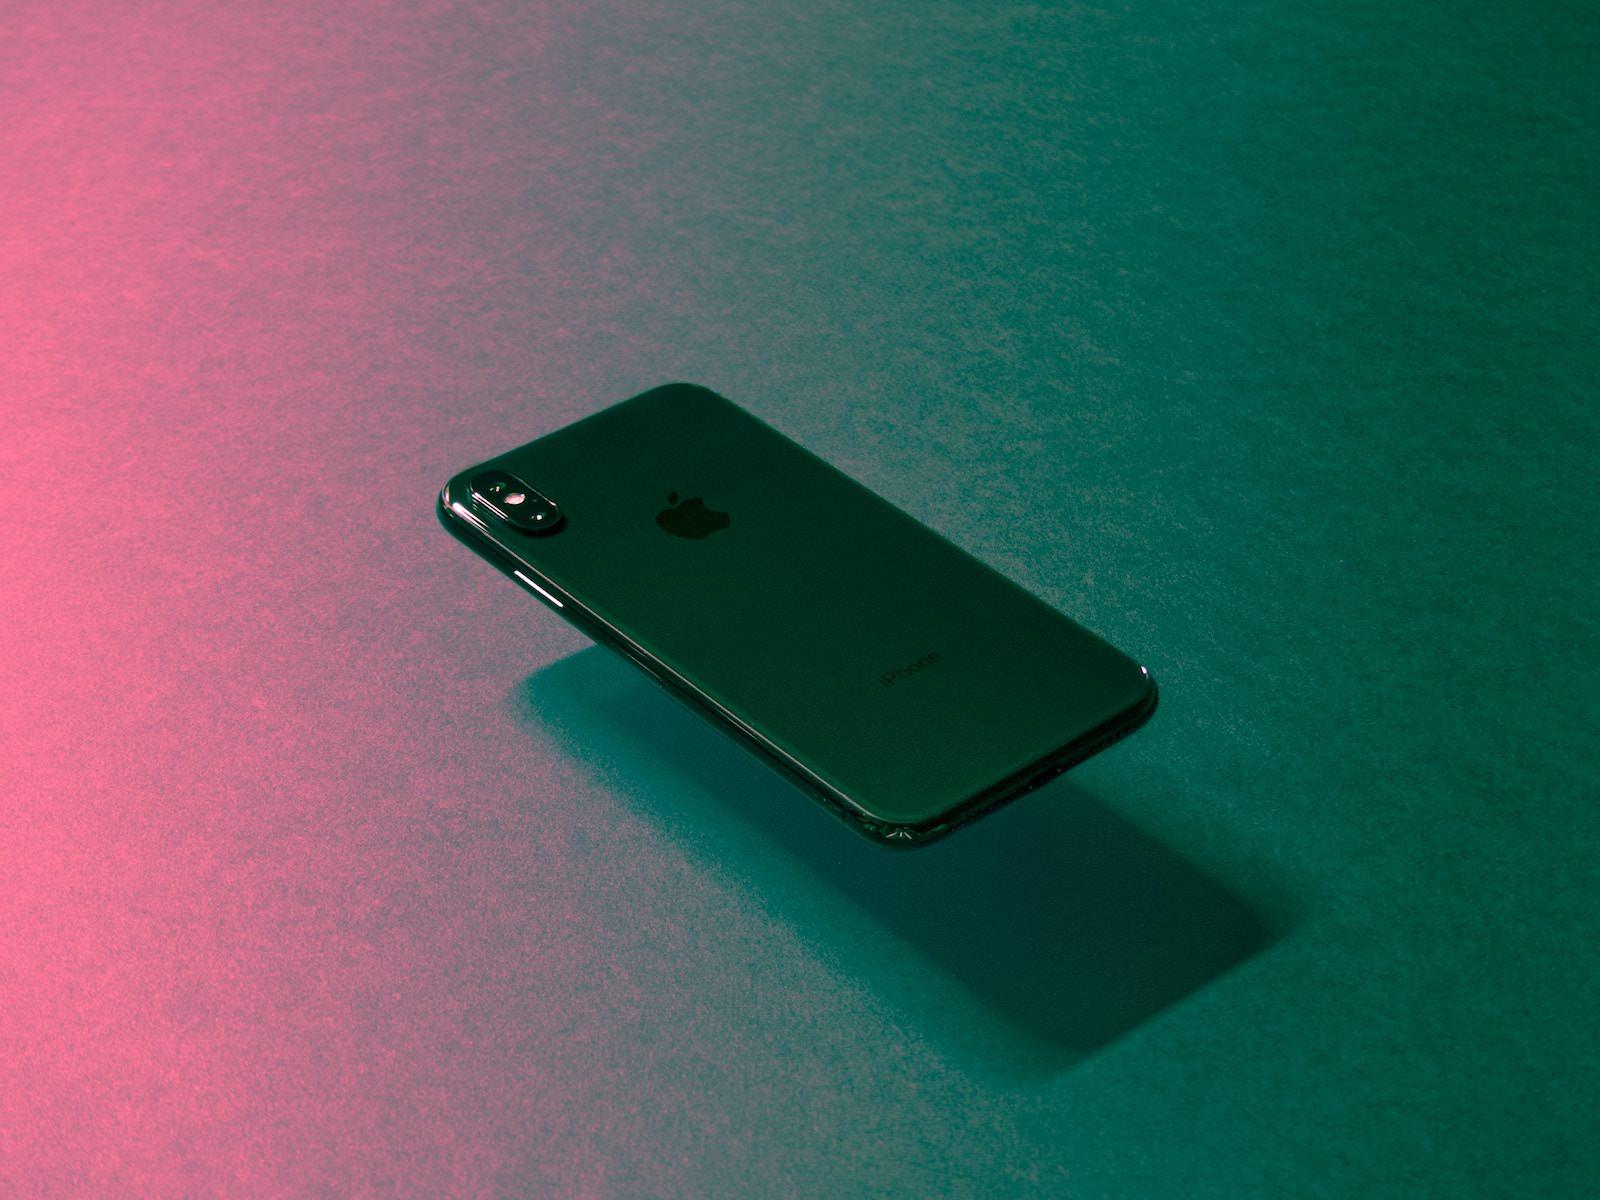 Tyler lastovich 454485 unsplash iphonex